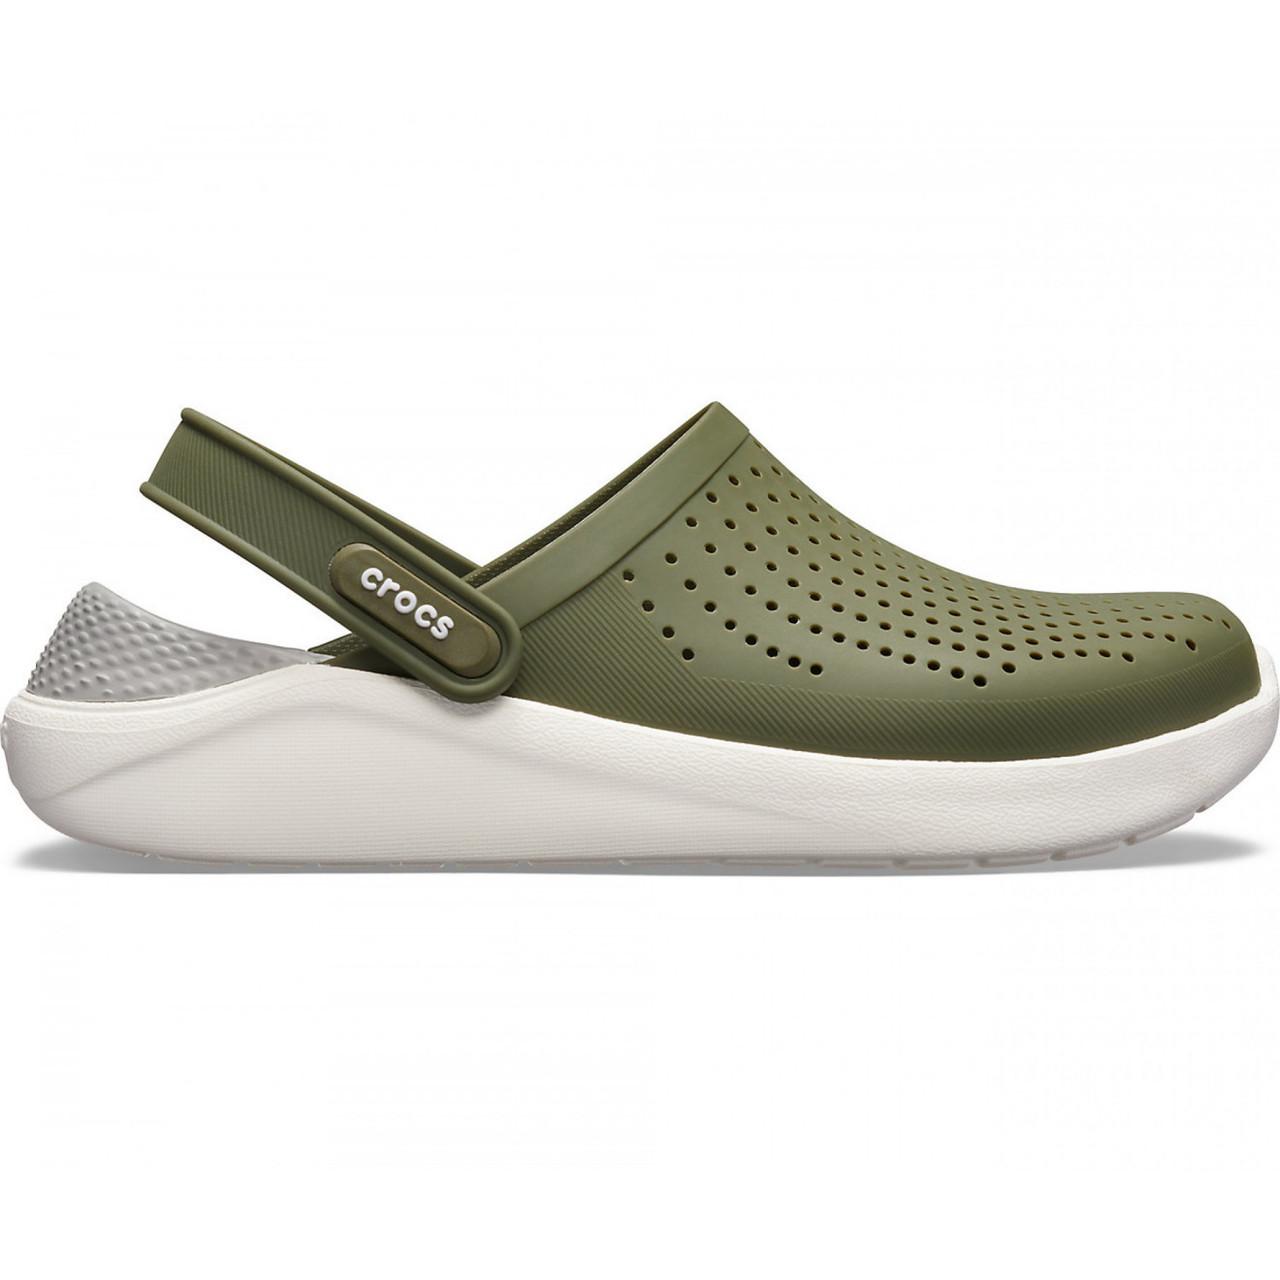 Crocs LiteRide Green Army